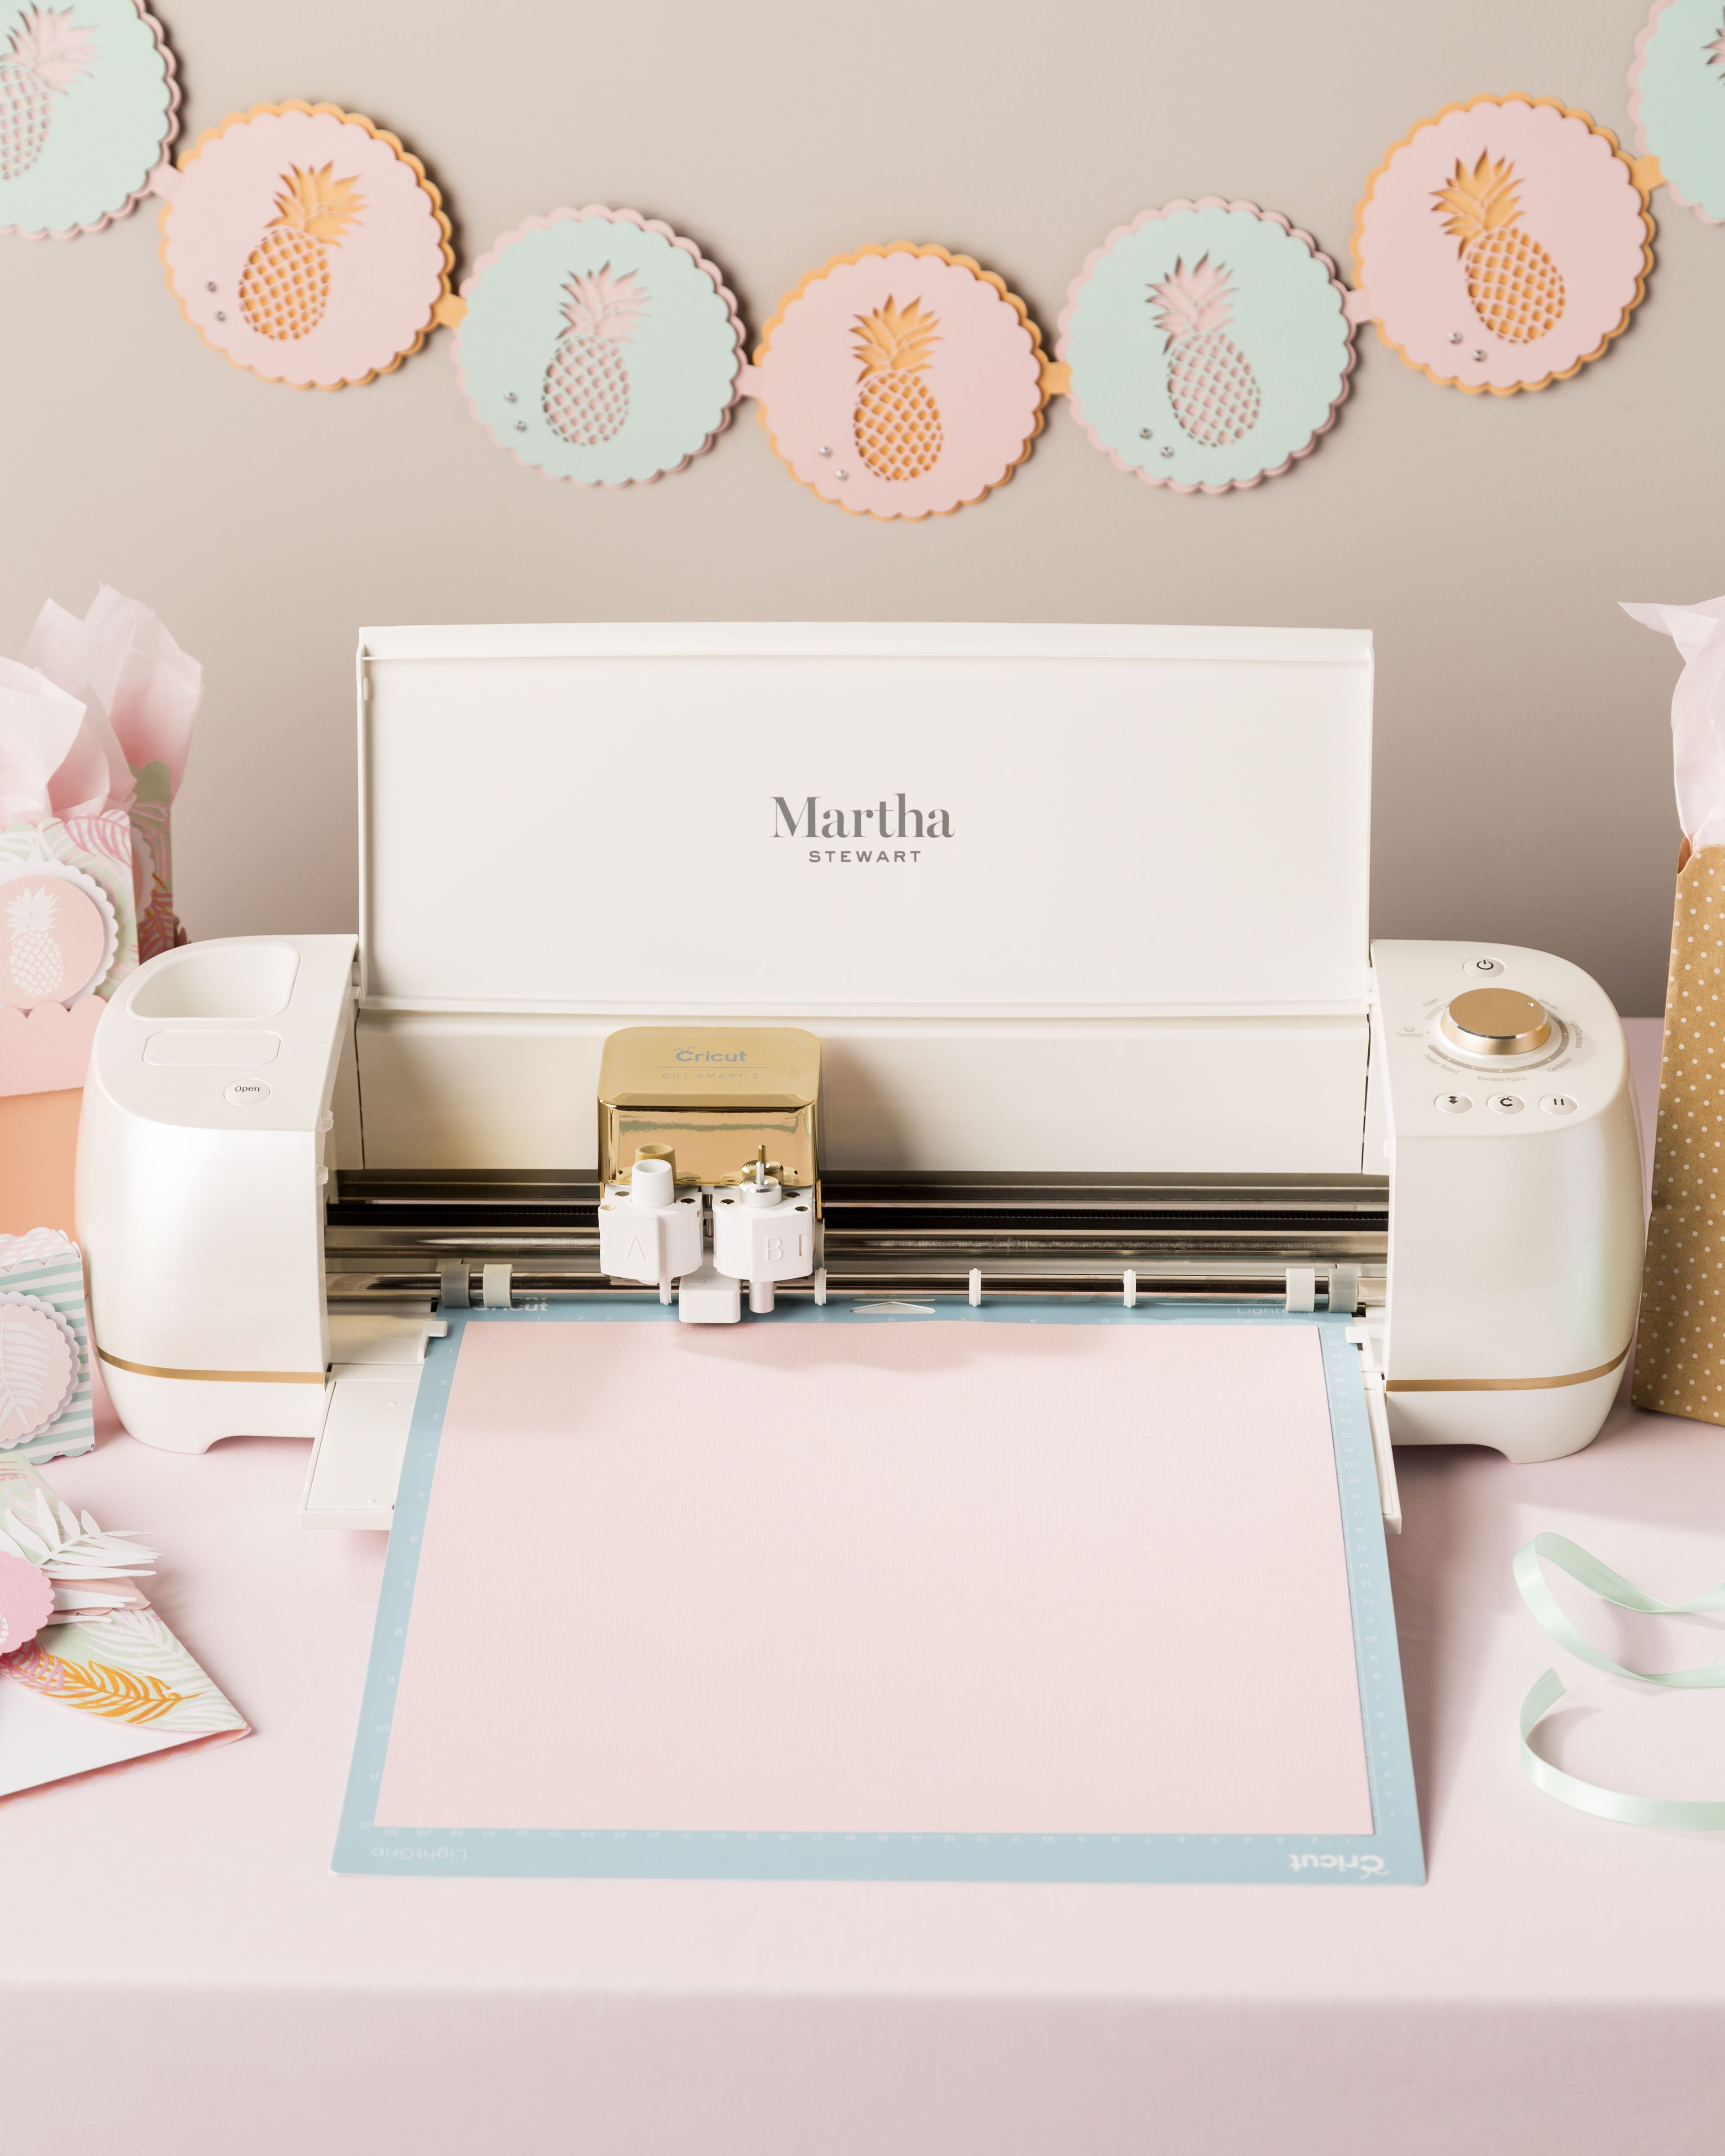 Martha Has Teamed Up With Cricut To Bring You The Martha Stewart Special Edition Cricut Explore Air 2 Machine Bundle Al Martha Crafts Crafts Diy Resin Crafts